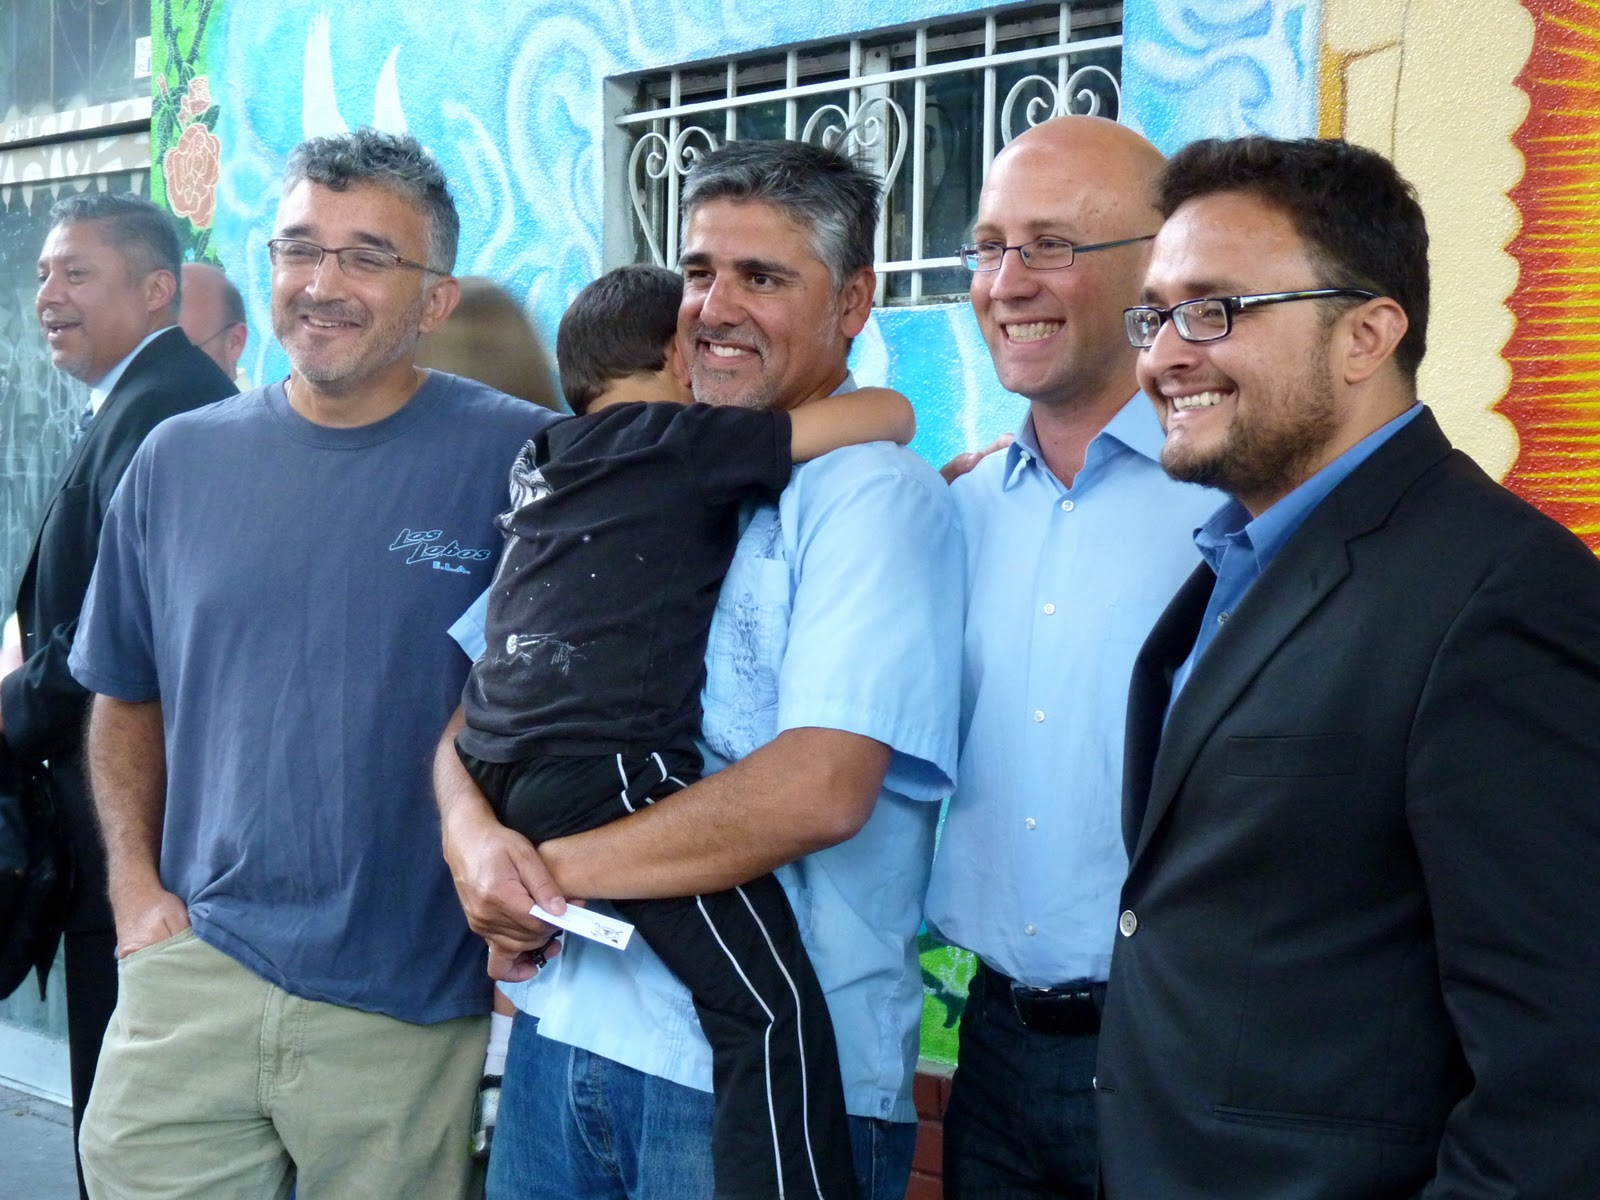 Latinos dating in san francisco